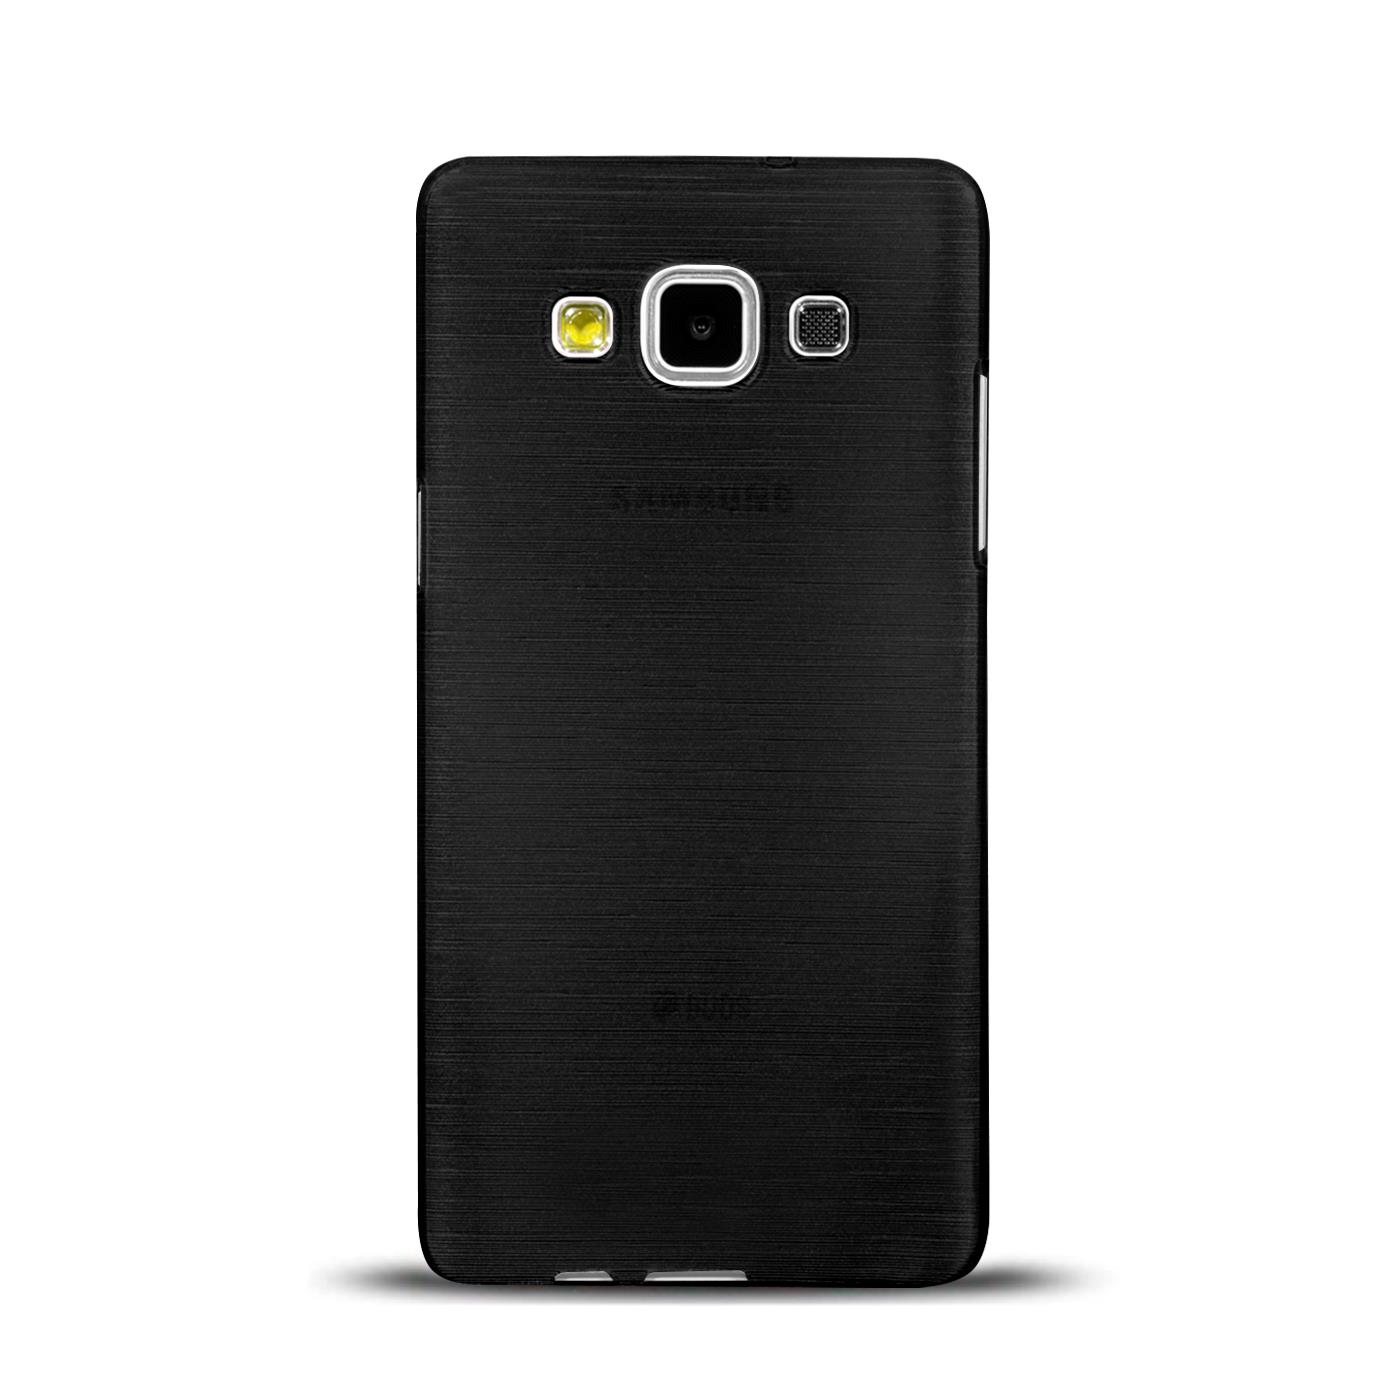 Silikon-Bumper-Case-Samsung-Galaxy-a5-2015-Ultra-Slim-Stossfeste-Rueckschale Indexbild 18